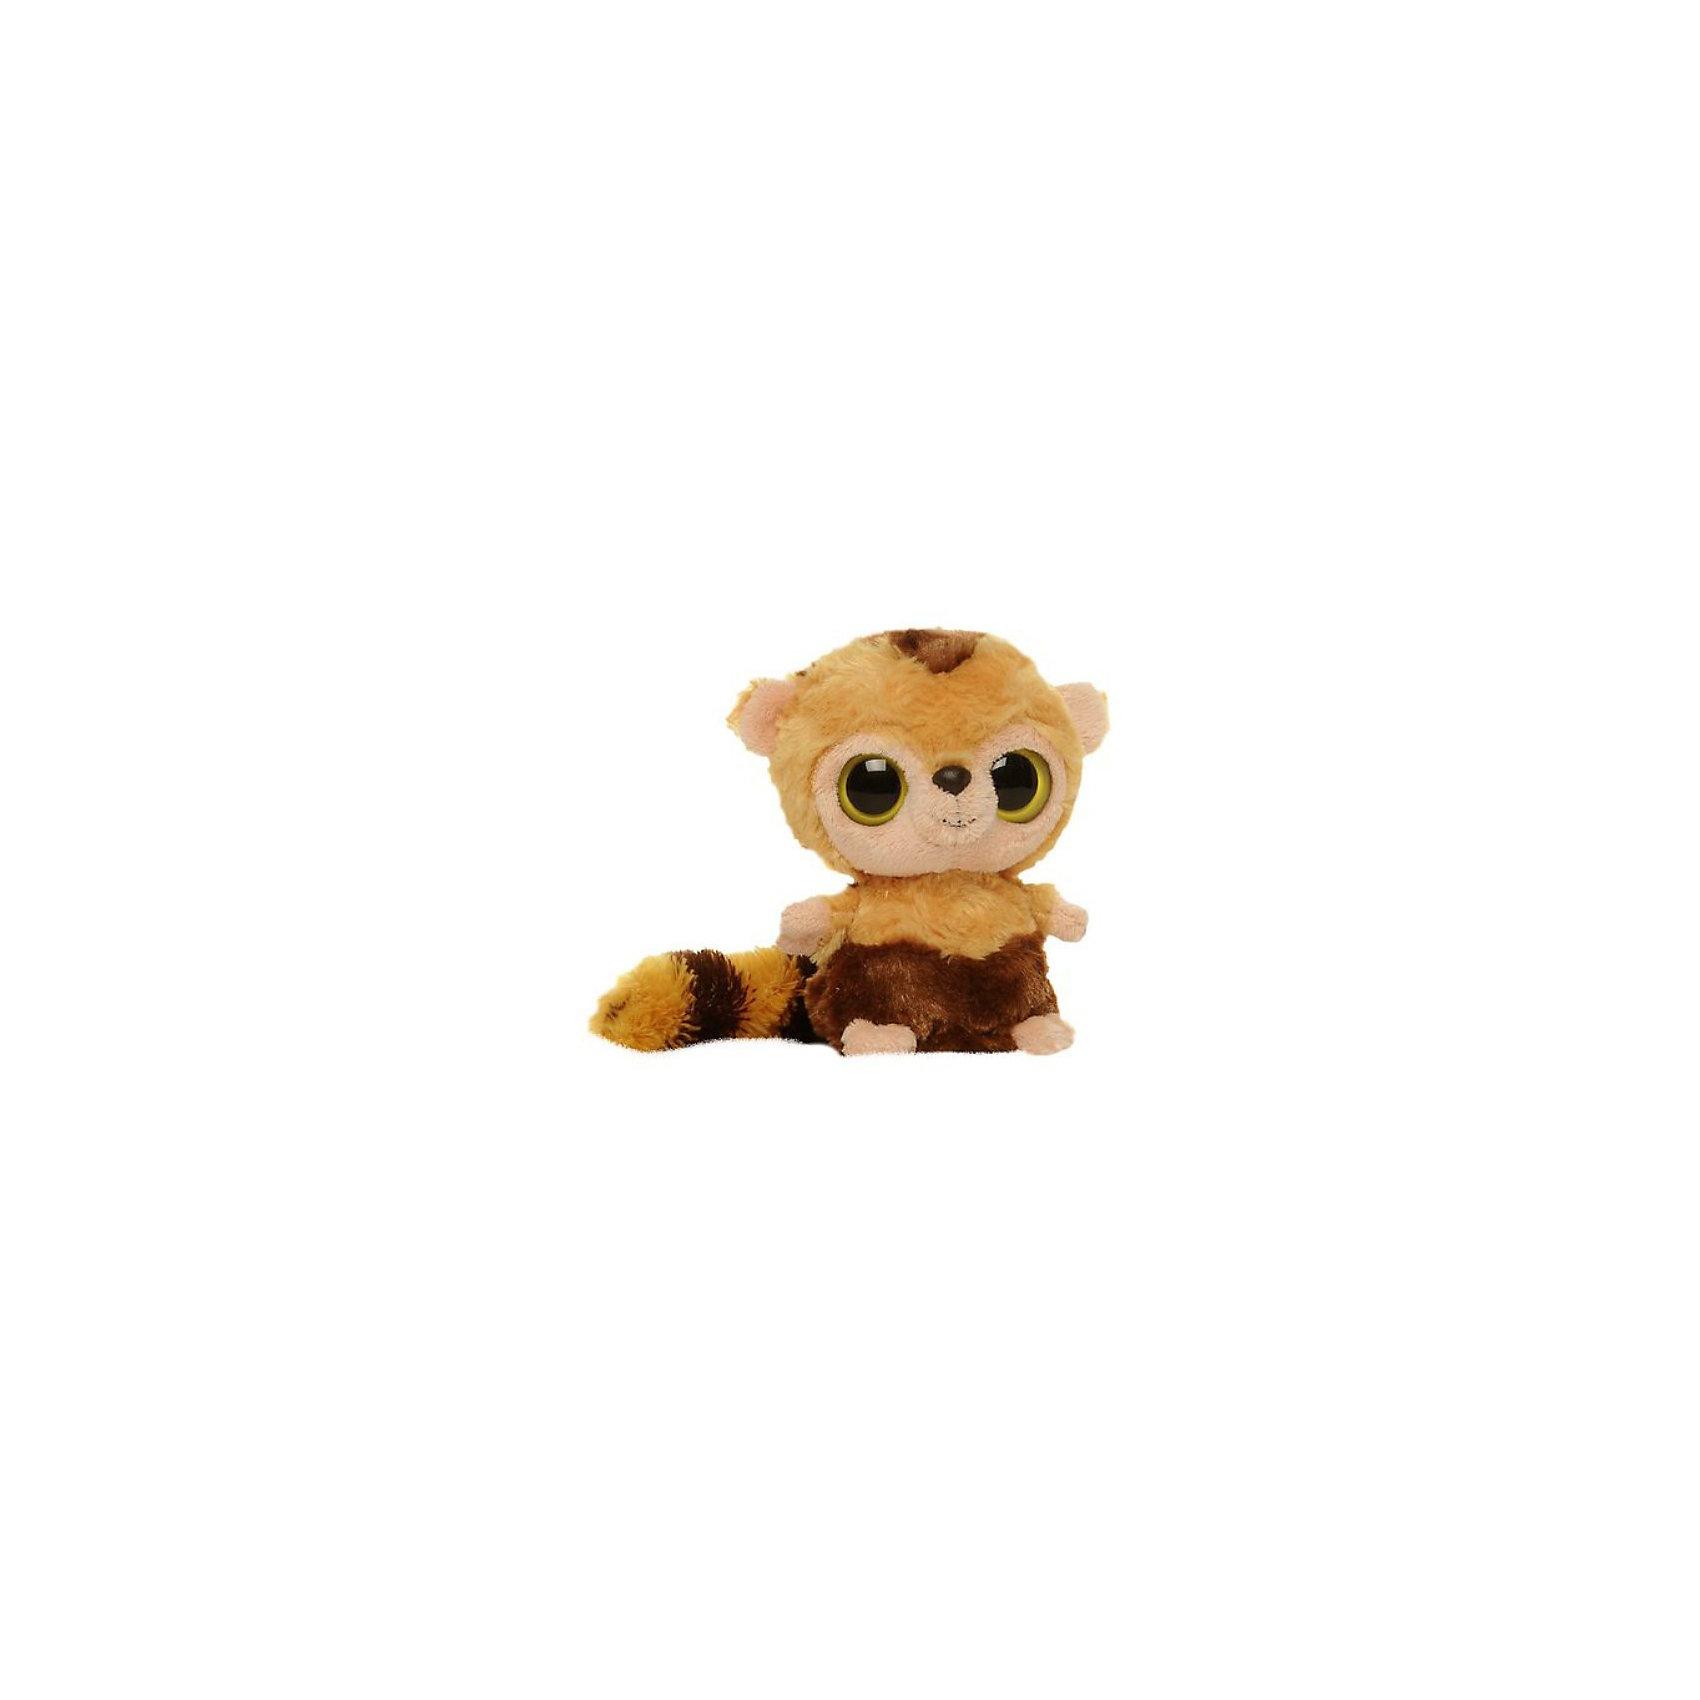 AURORA AURORA Мягкая игрушка  Обезьяна Капуцин, 20 см малышарики мягкая игрушка собака бассет хаунд 23 см